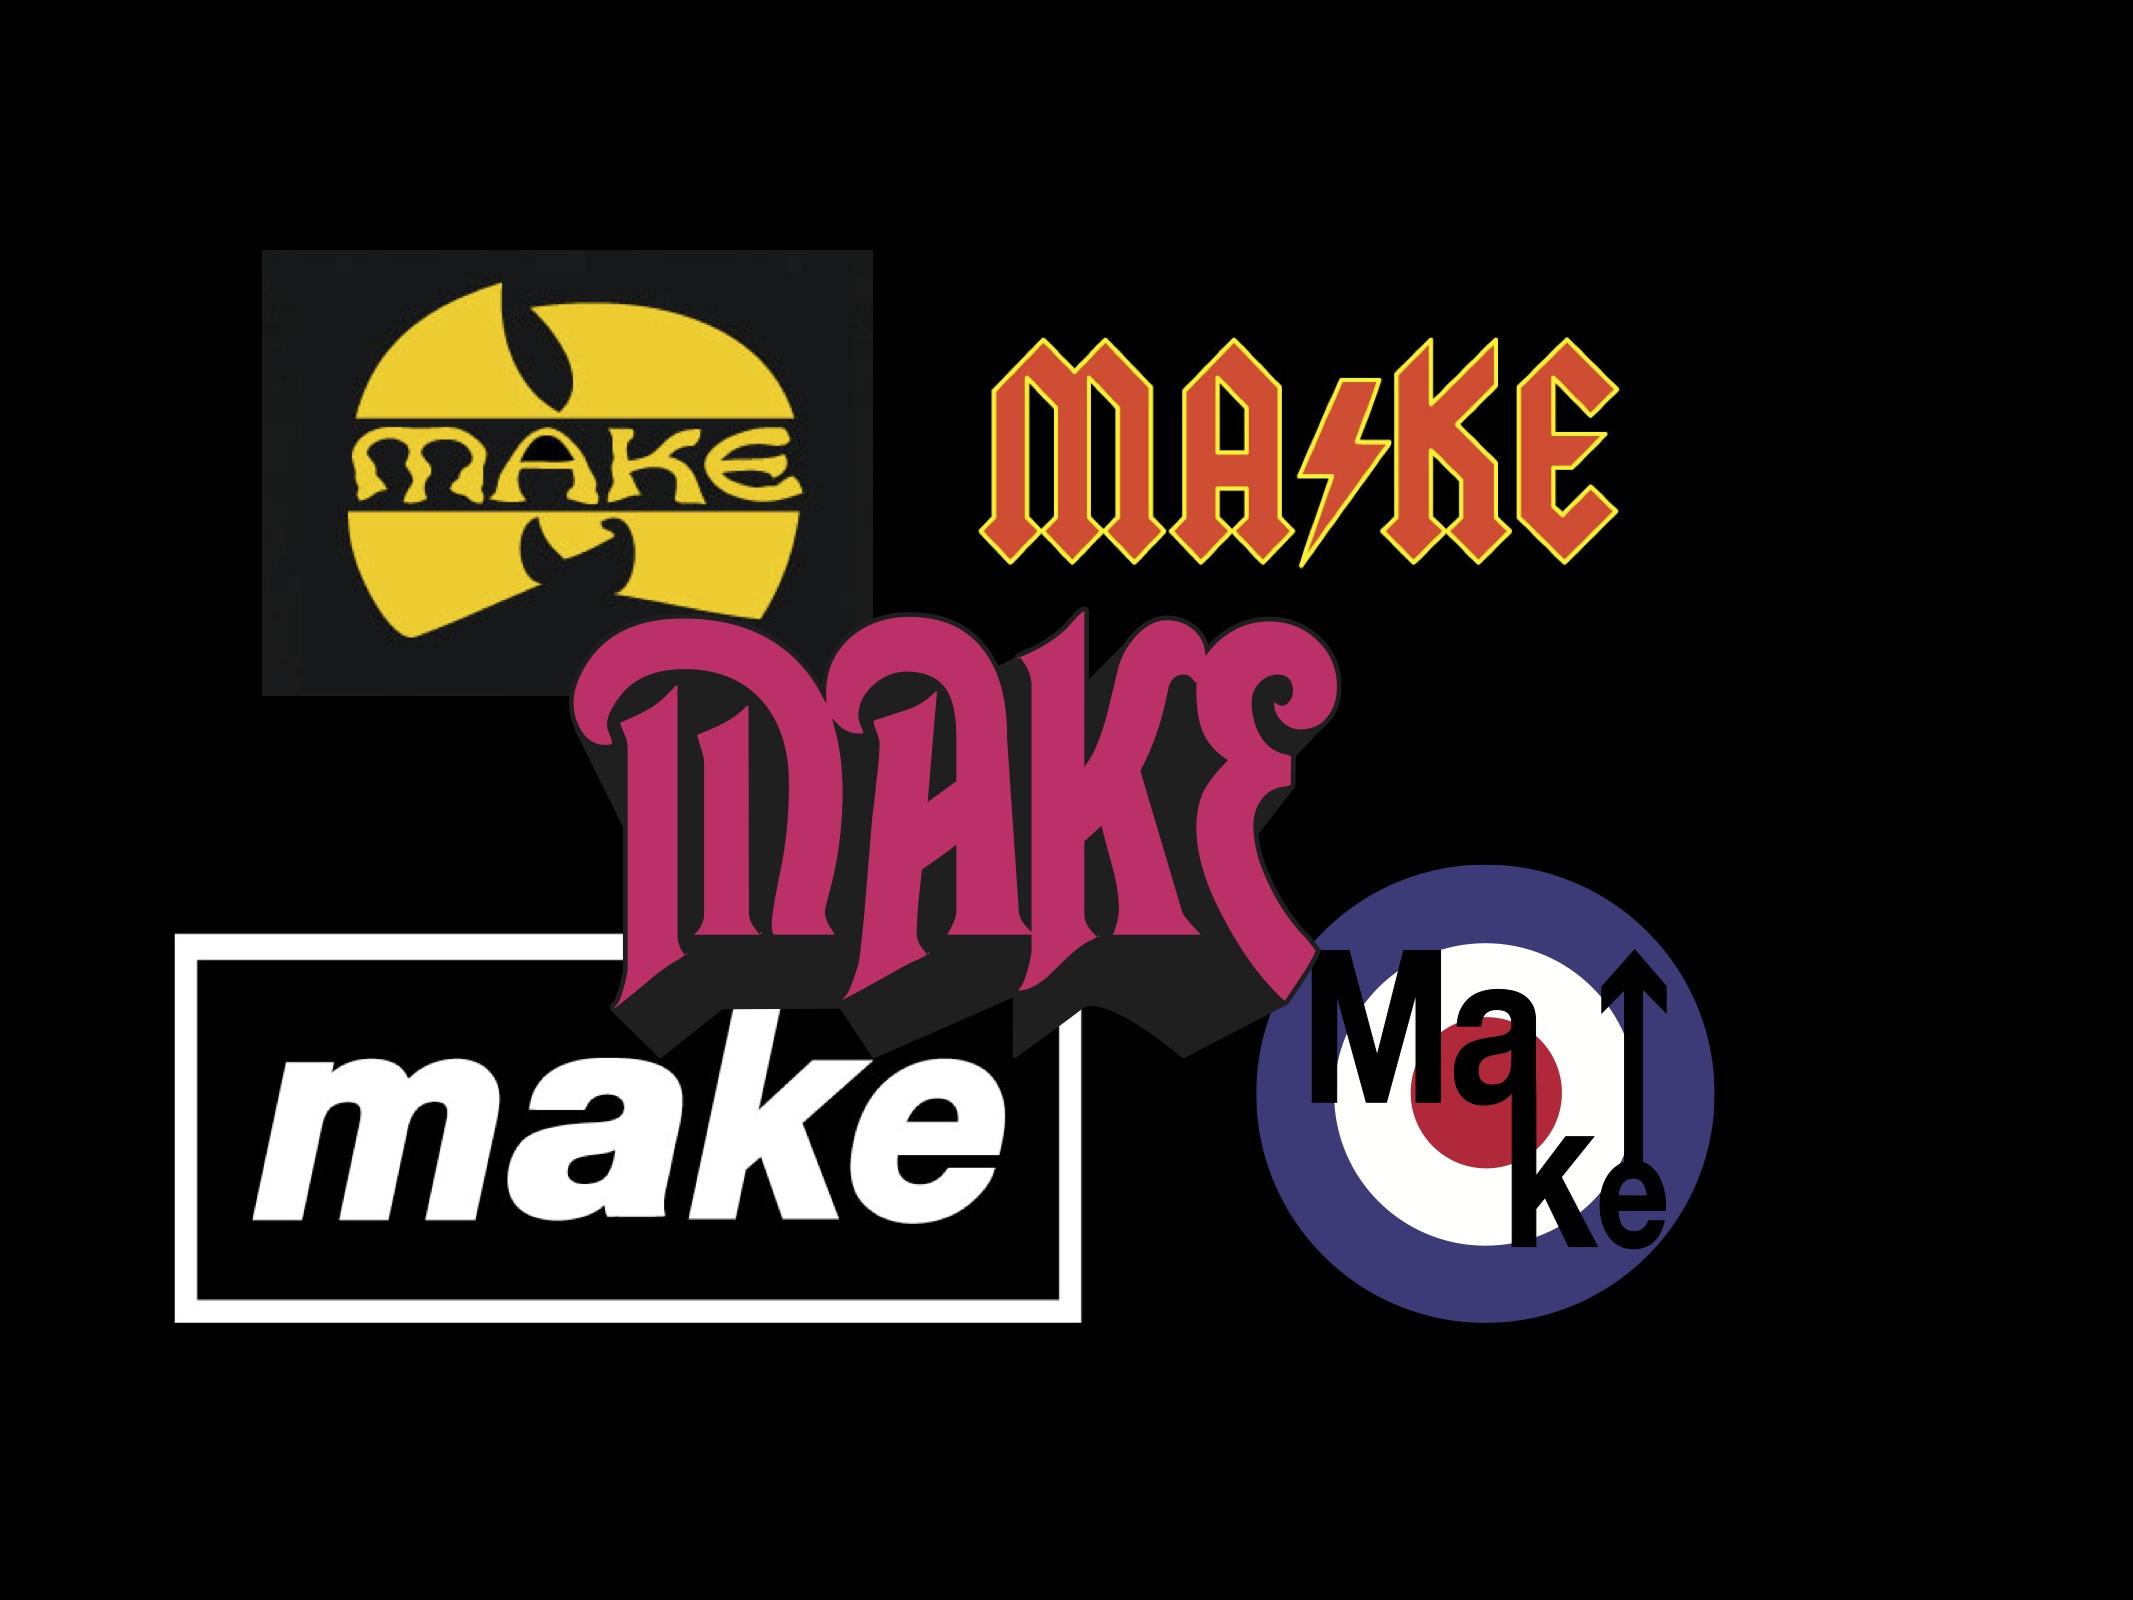 makerocks